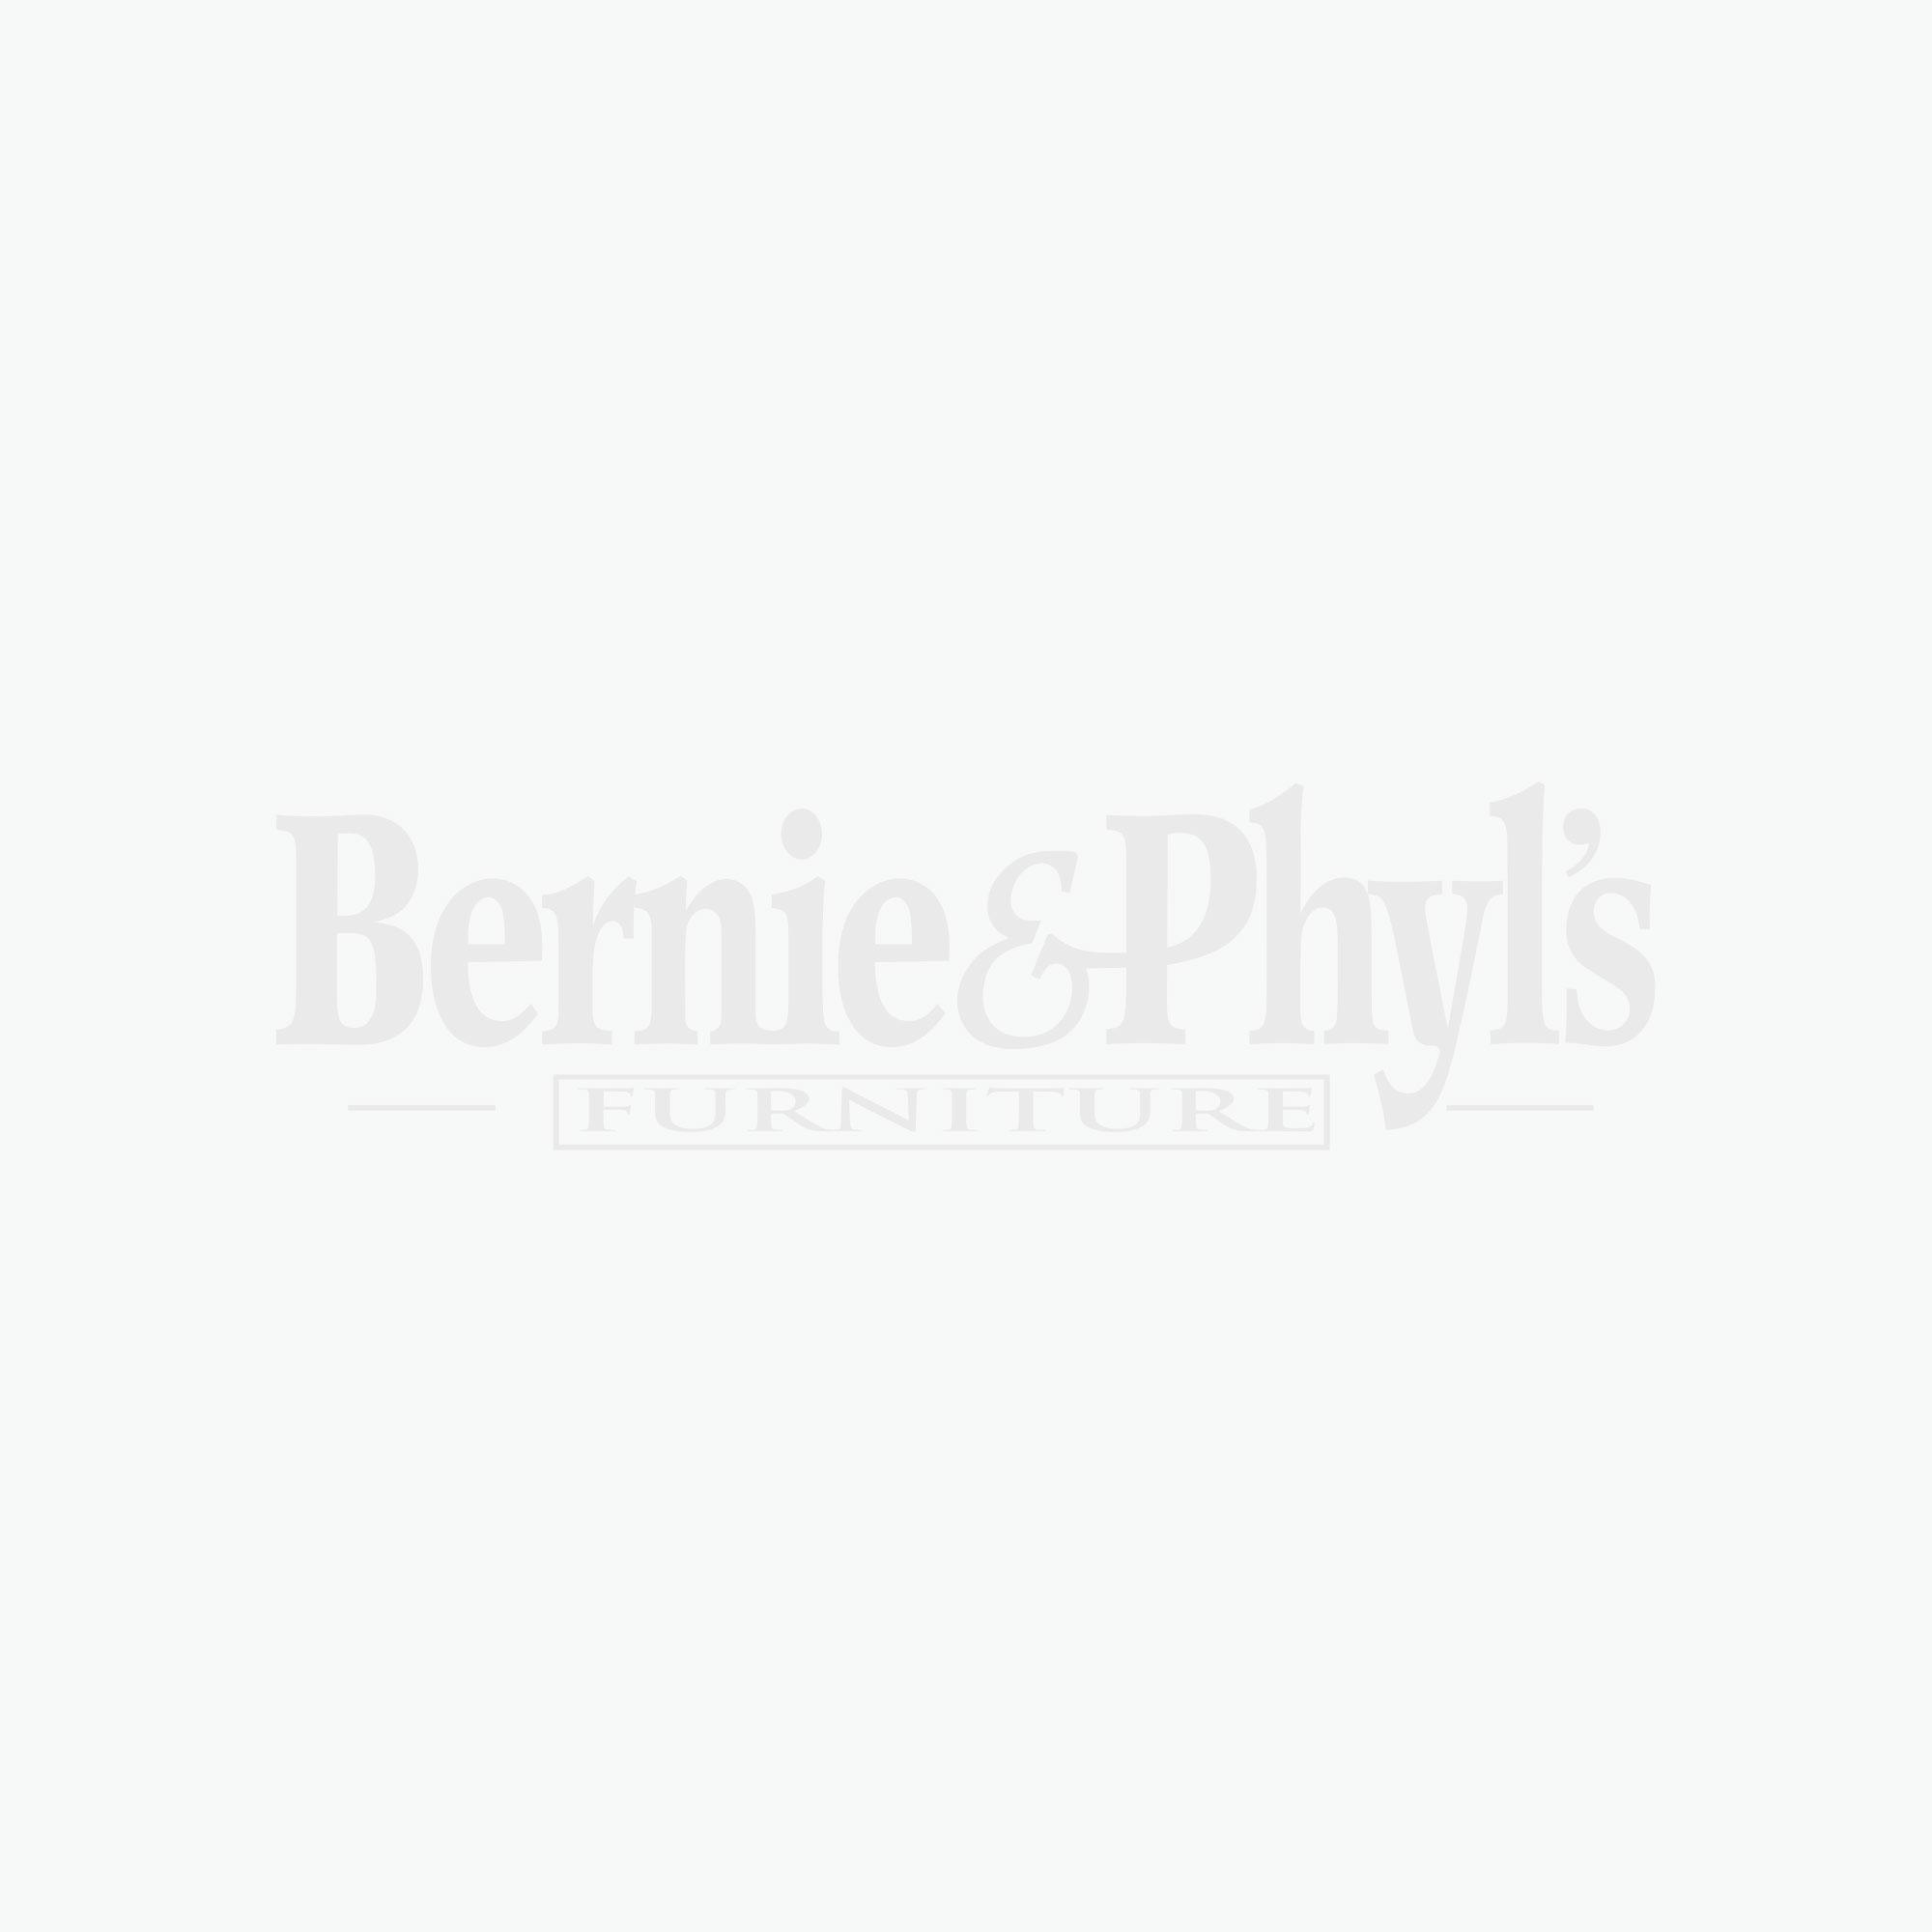 breville espresso sofa bernie phyl s furniture by